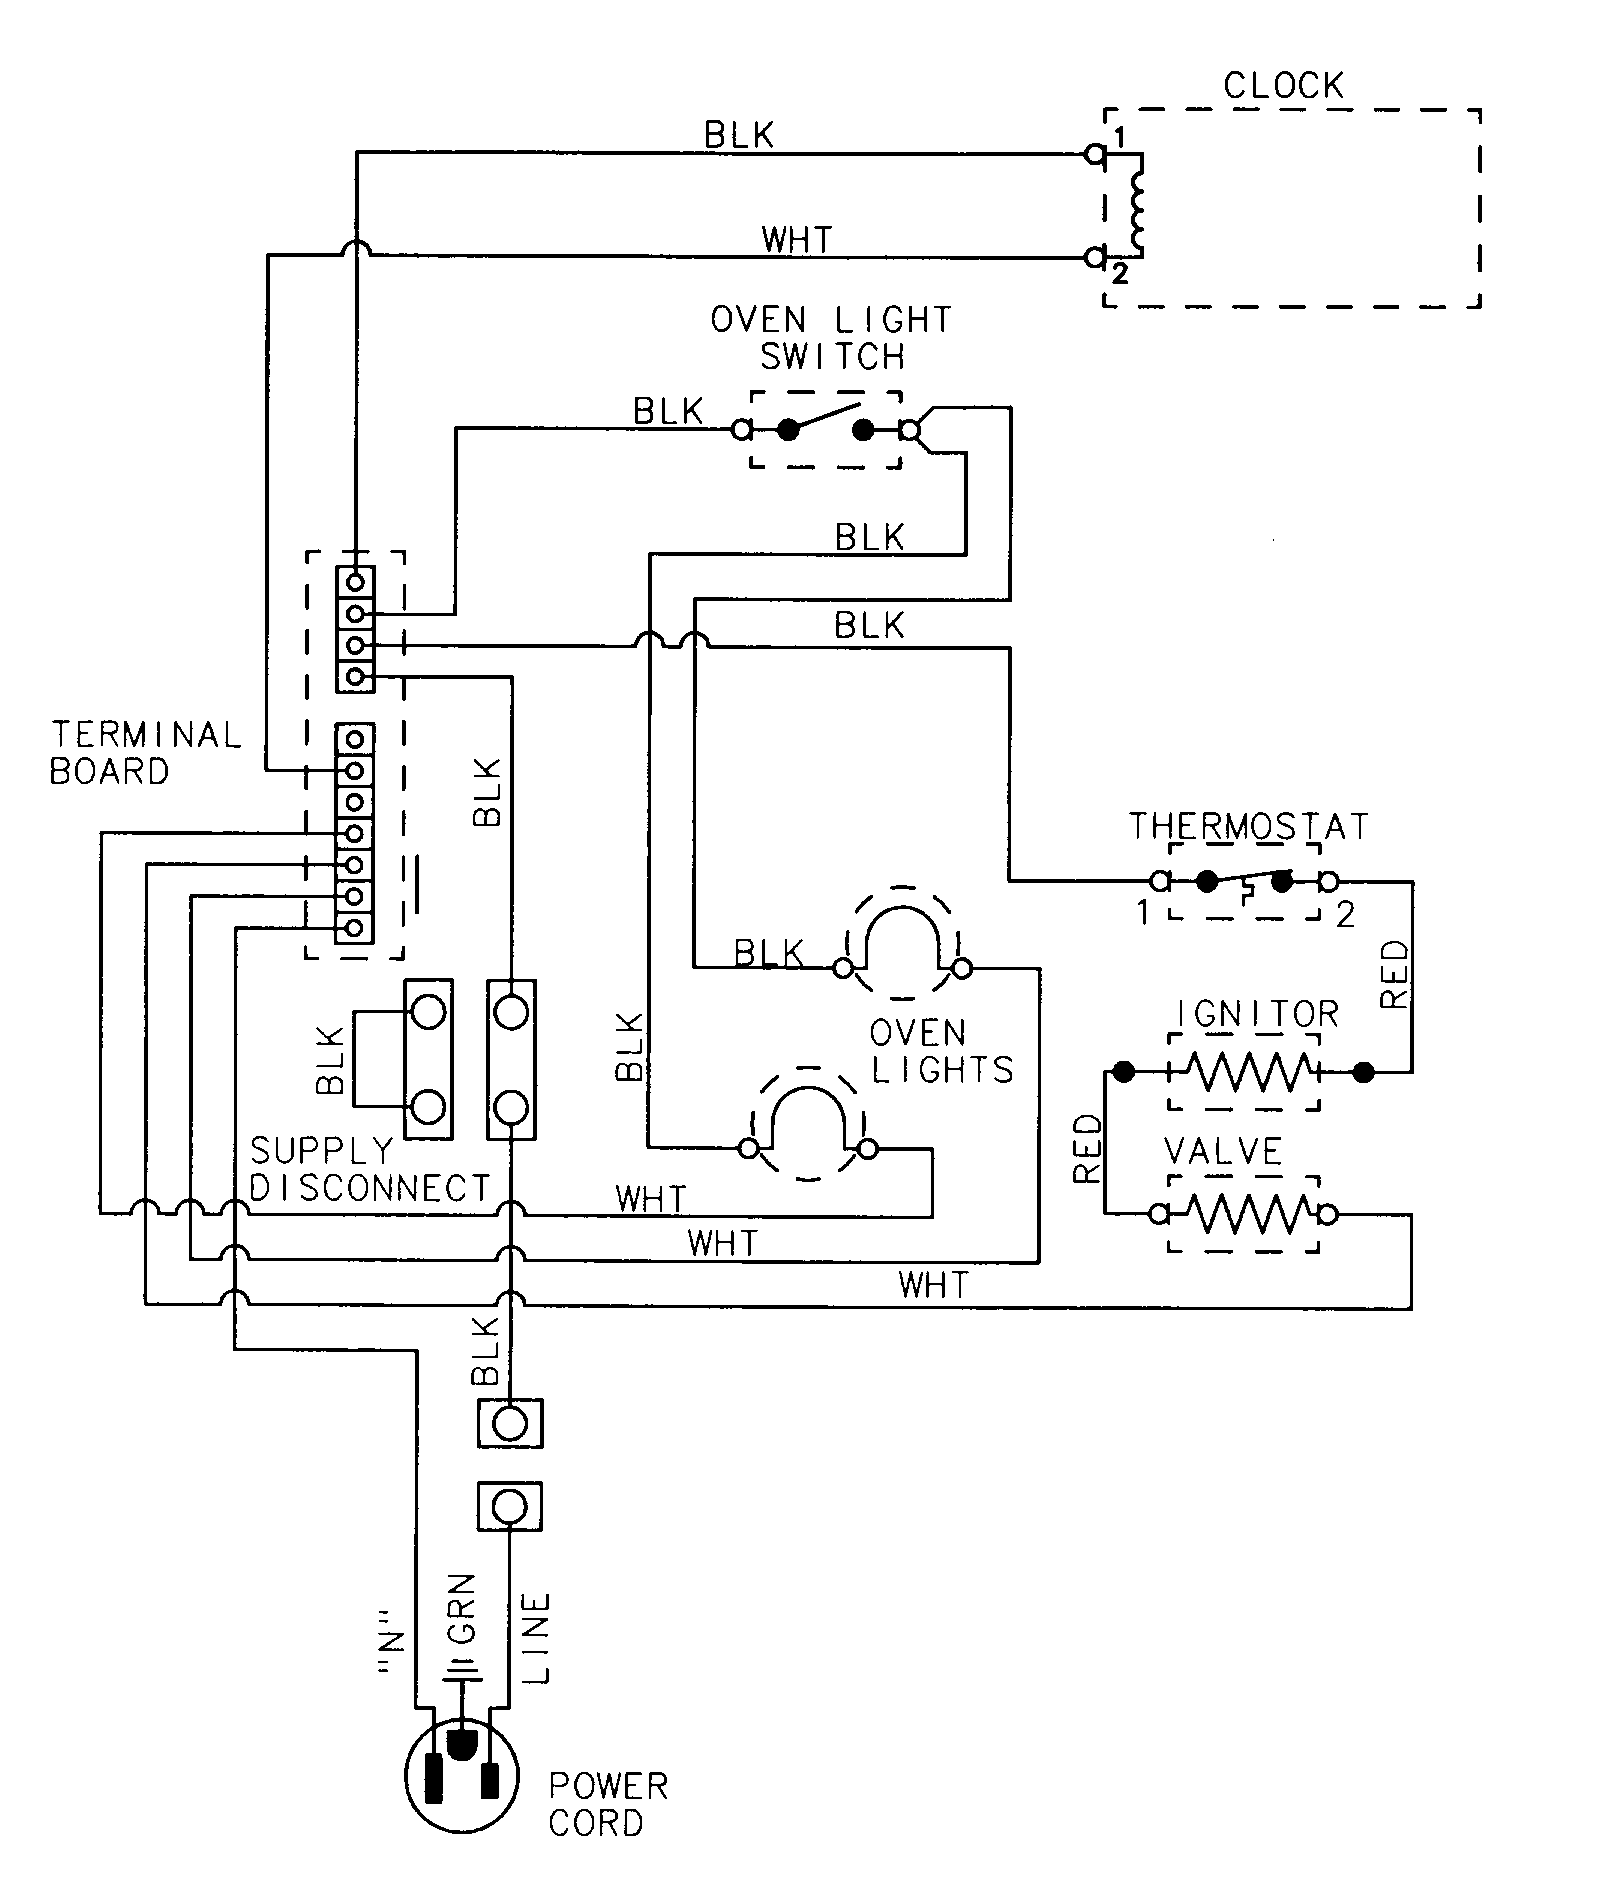 Magic-Chef model 9112WUV wall oven, gas genuine parts